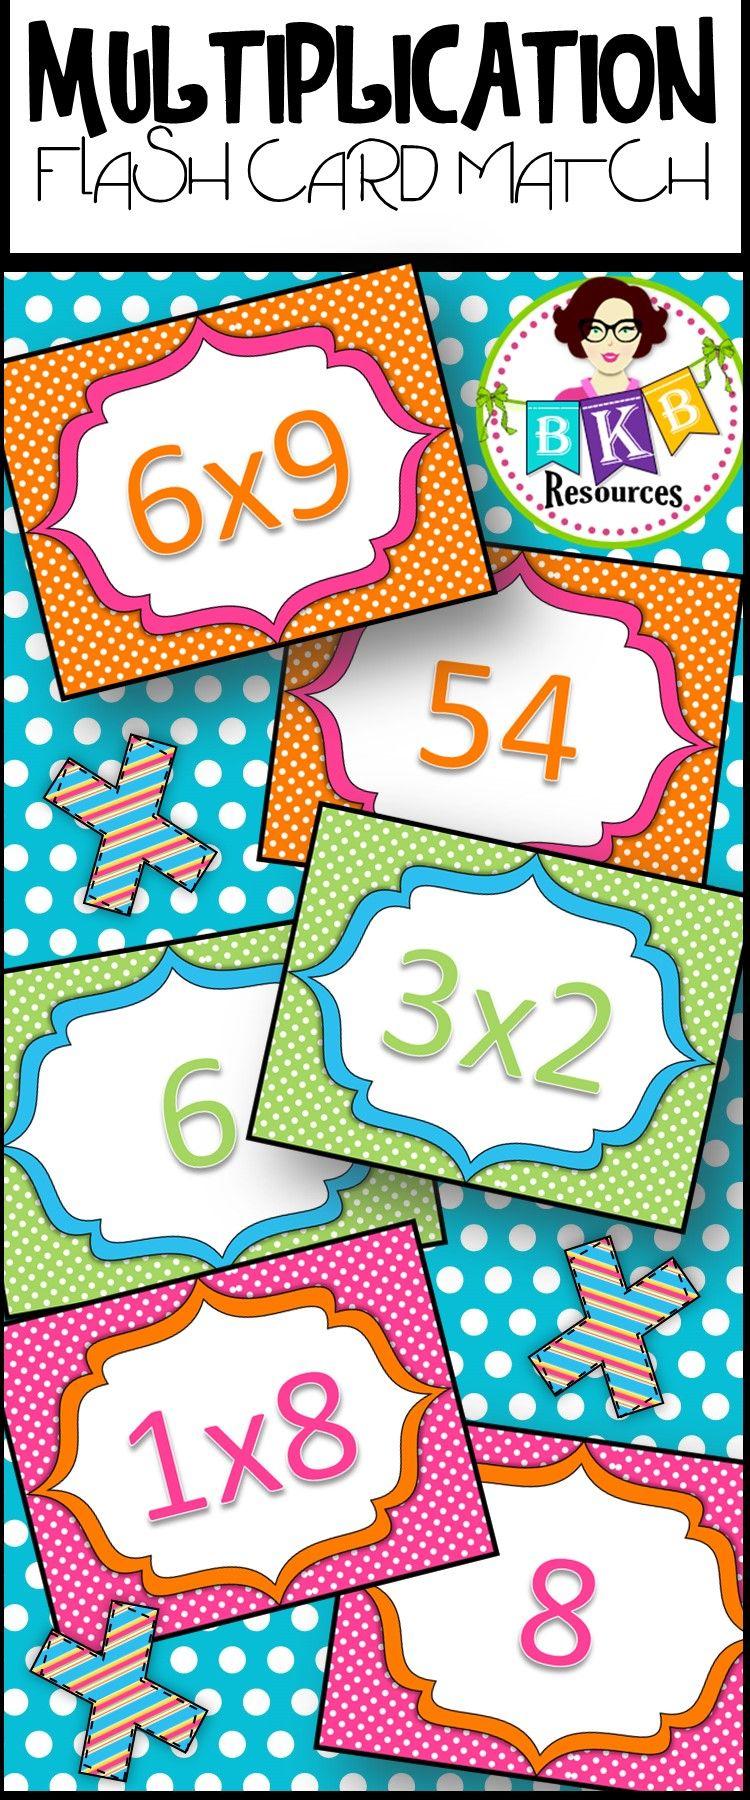 Multiplication Flash Card Match   Multiplication Flashcards